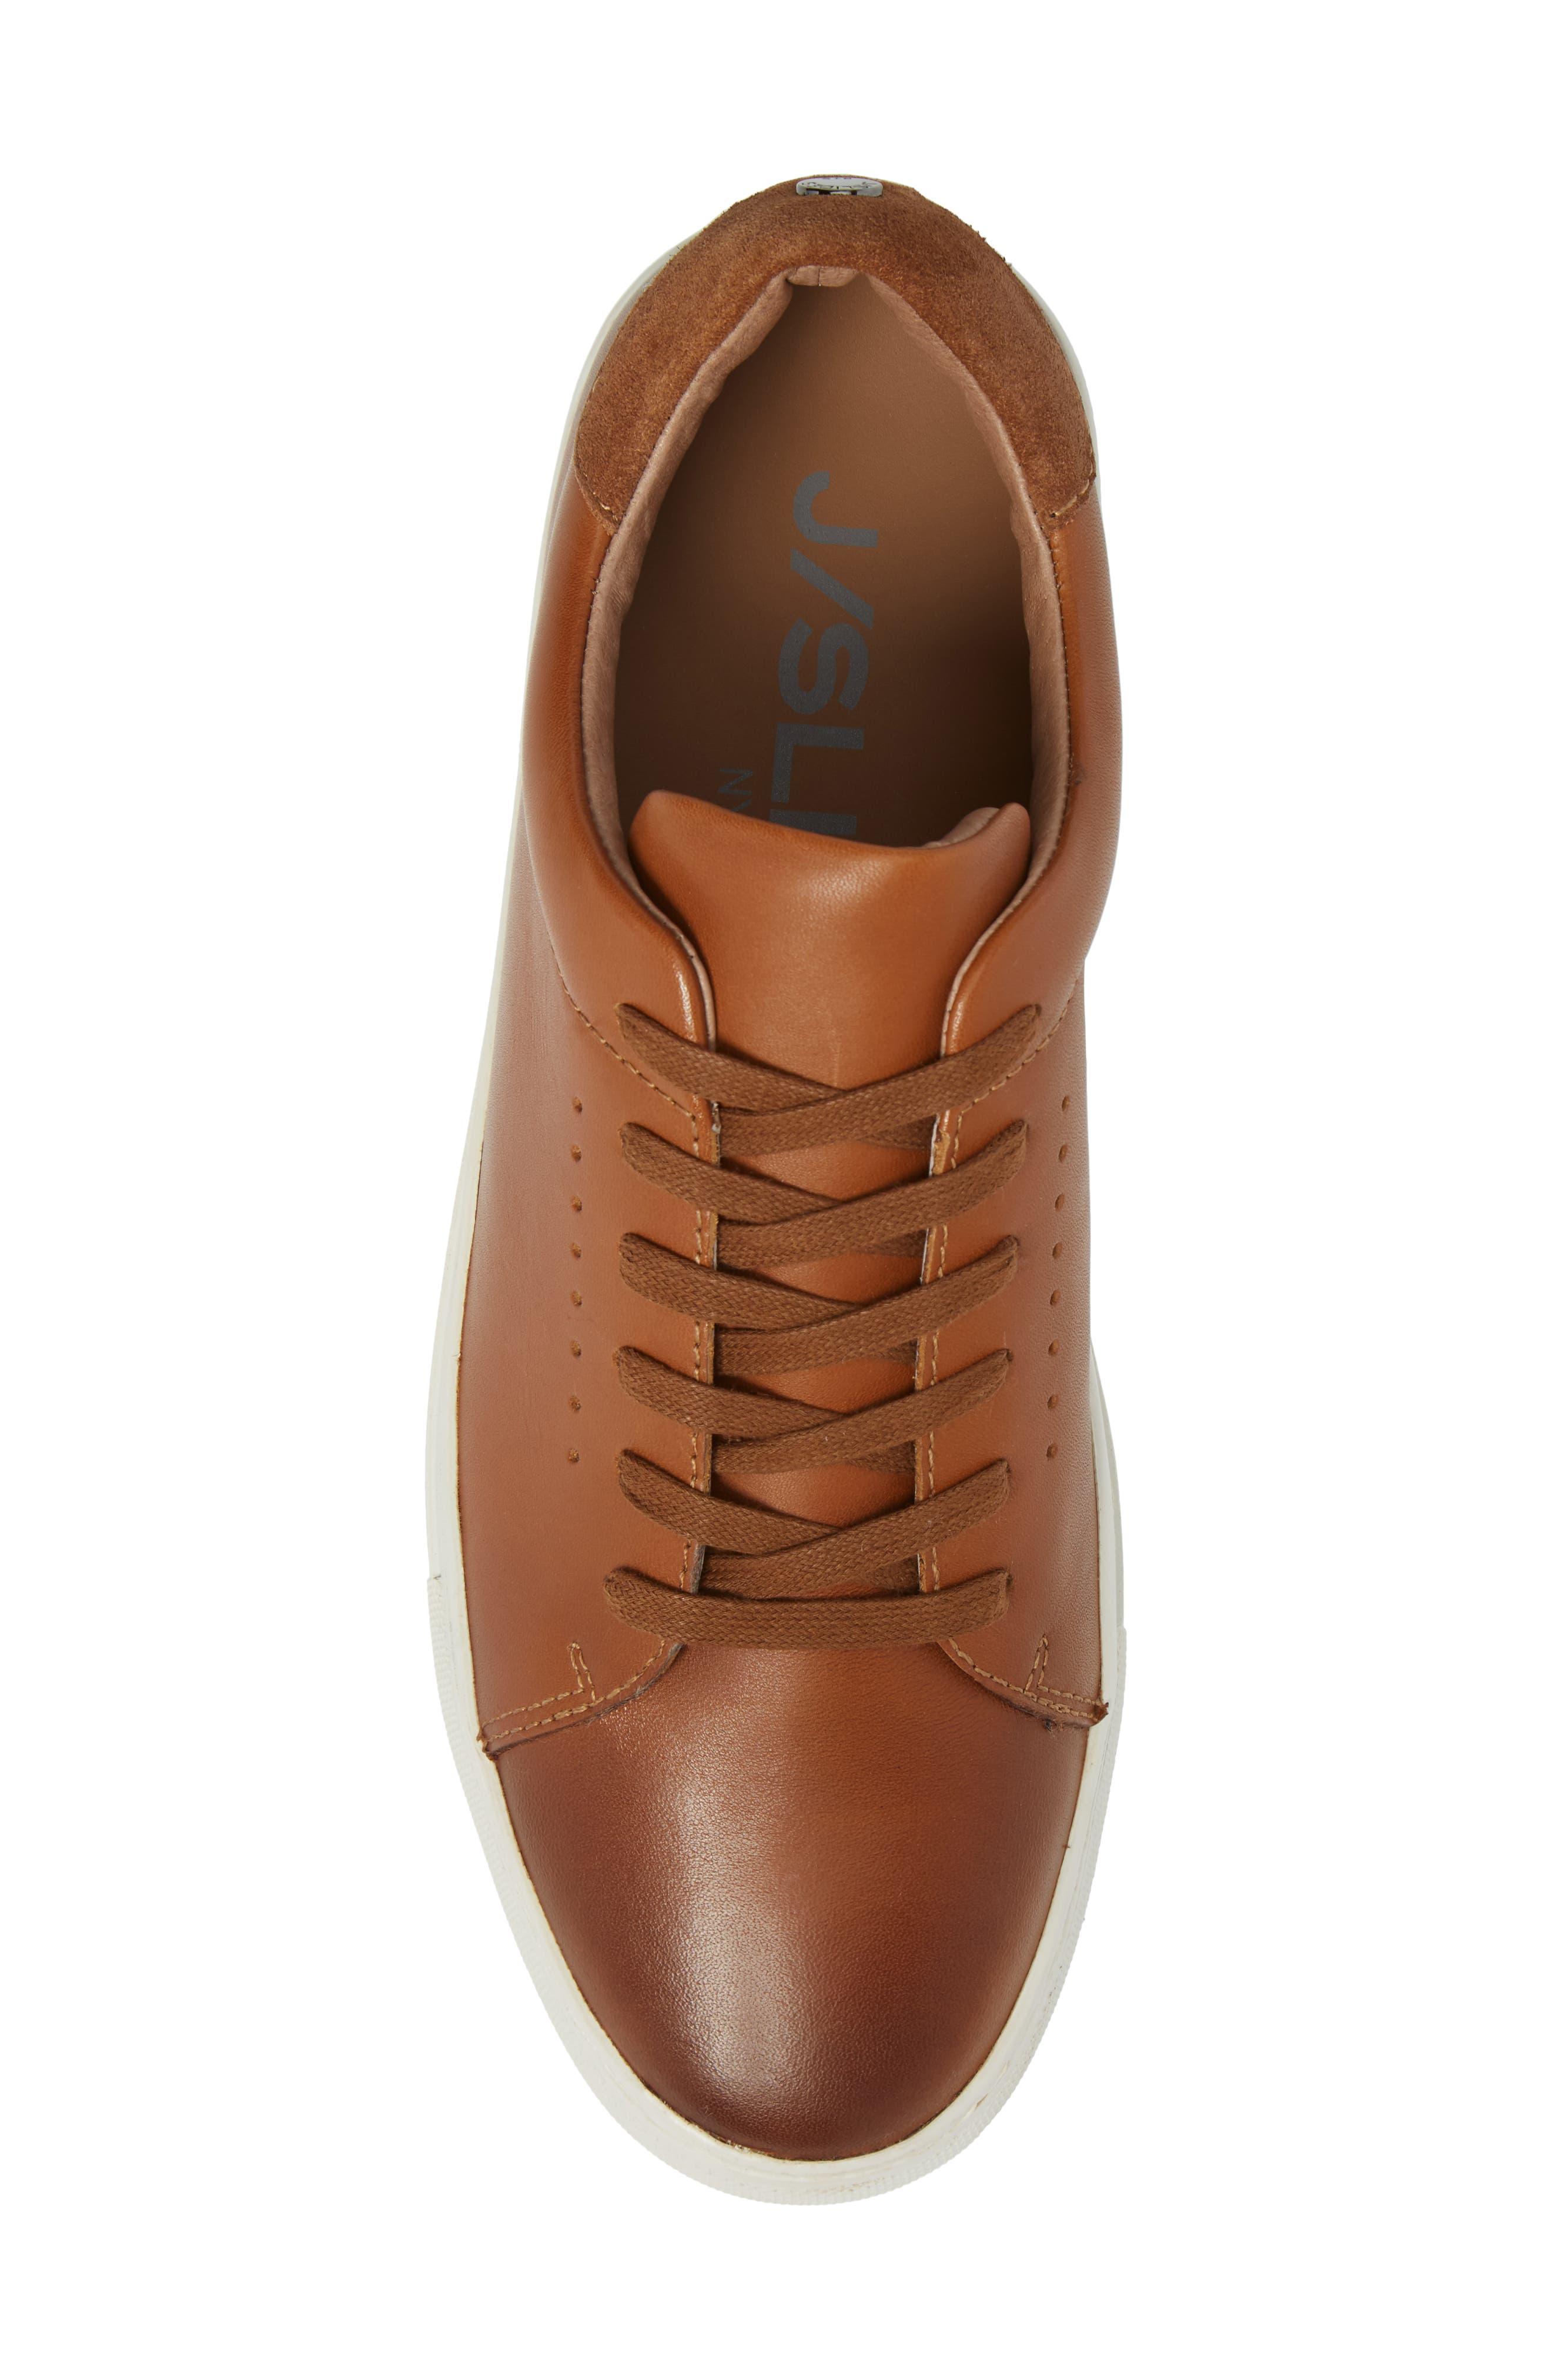 Desmond Sneaker,                             Alternate thumbnail 5, color,                             Tan Leather